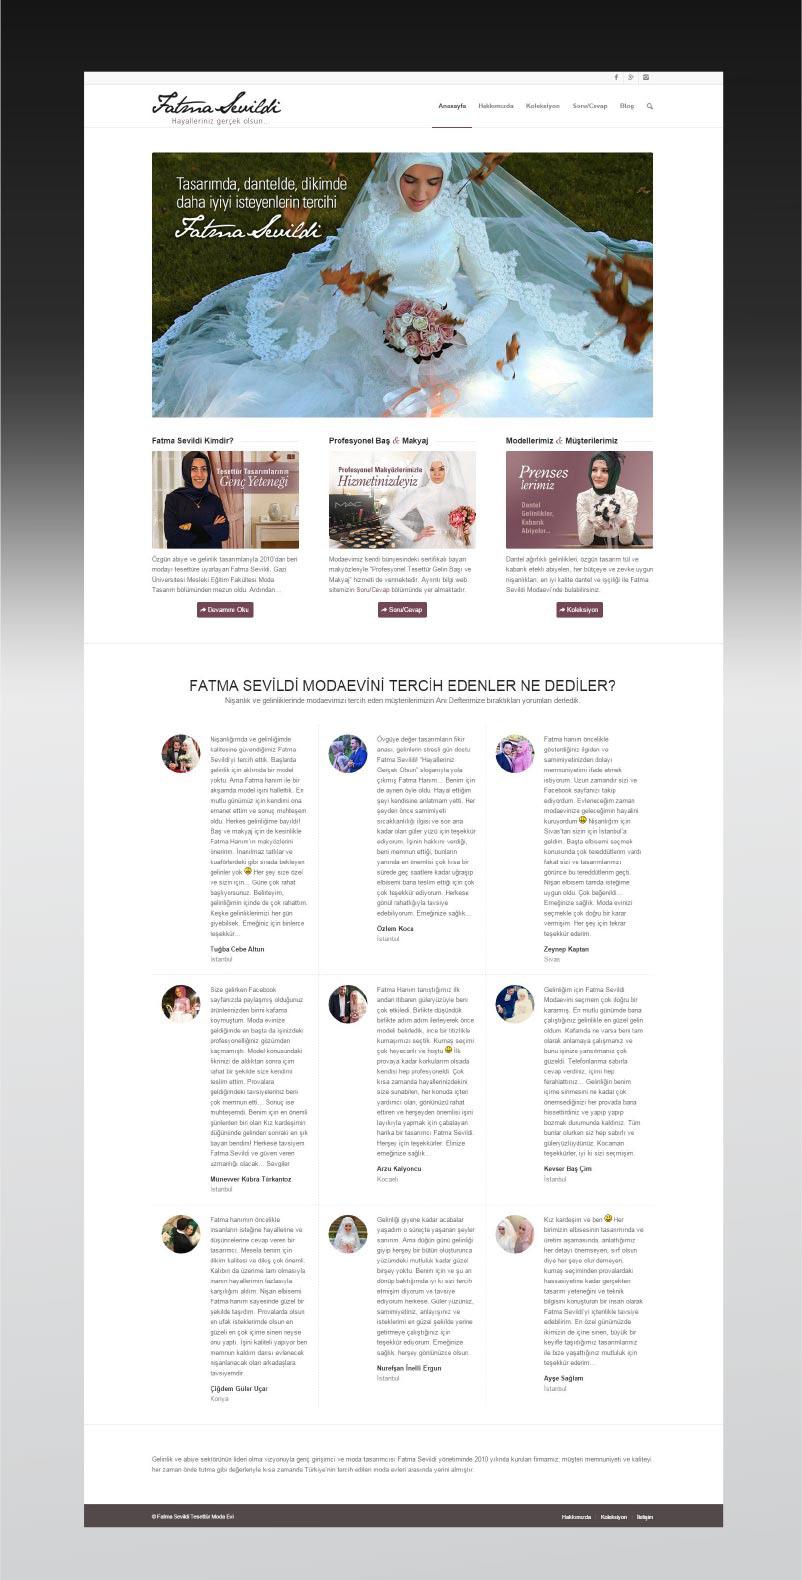 Fatma Sevildi Fashion House houte couture